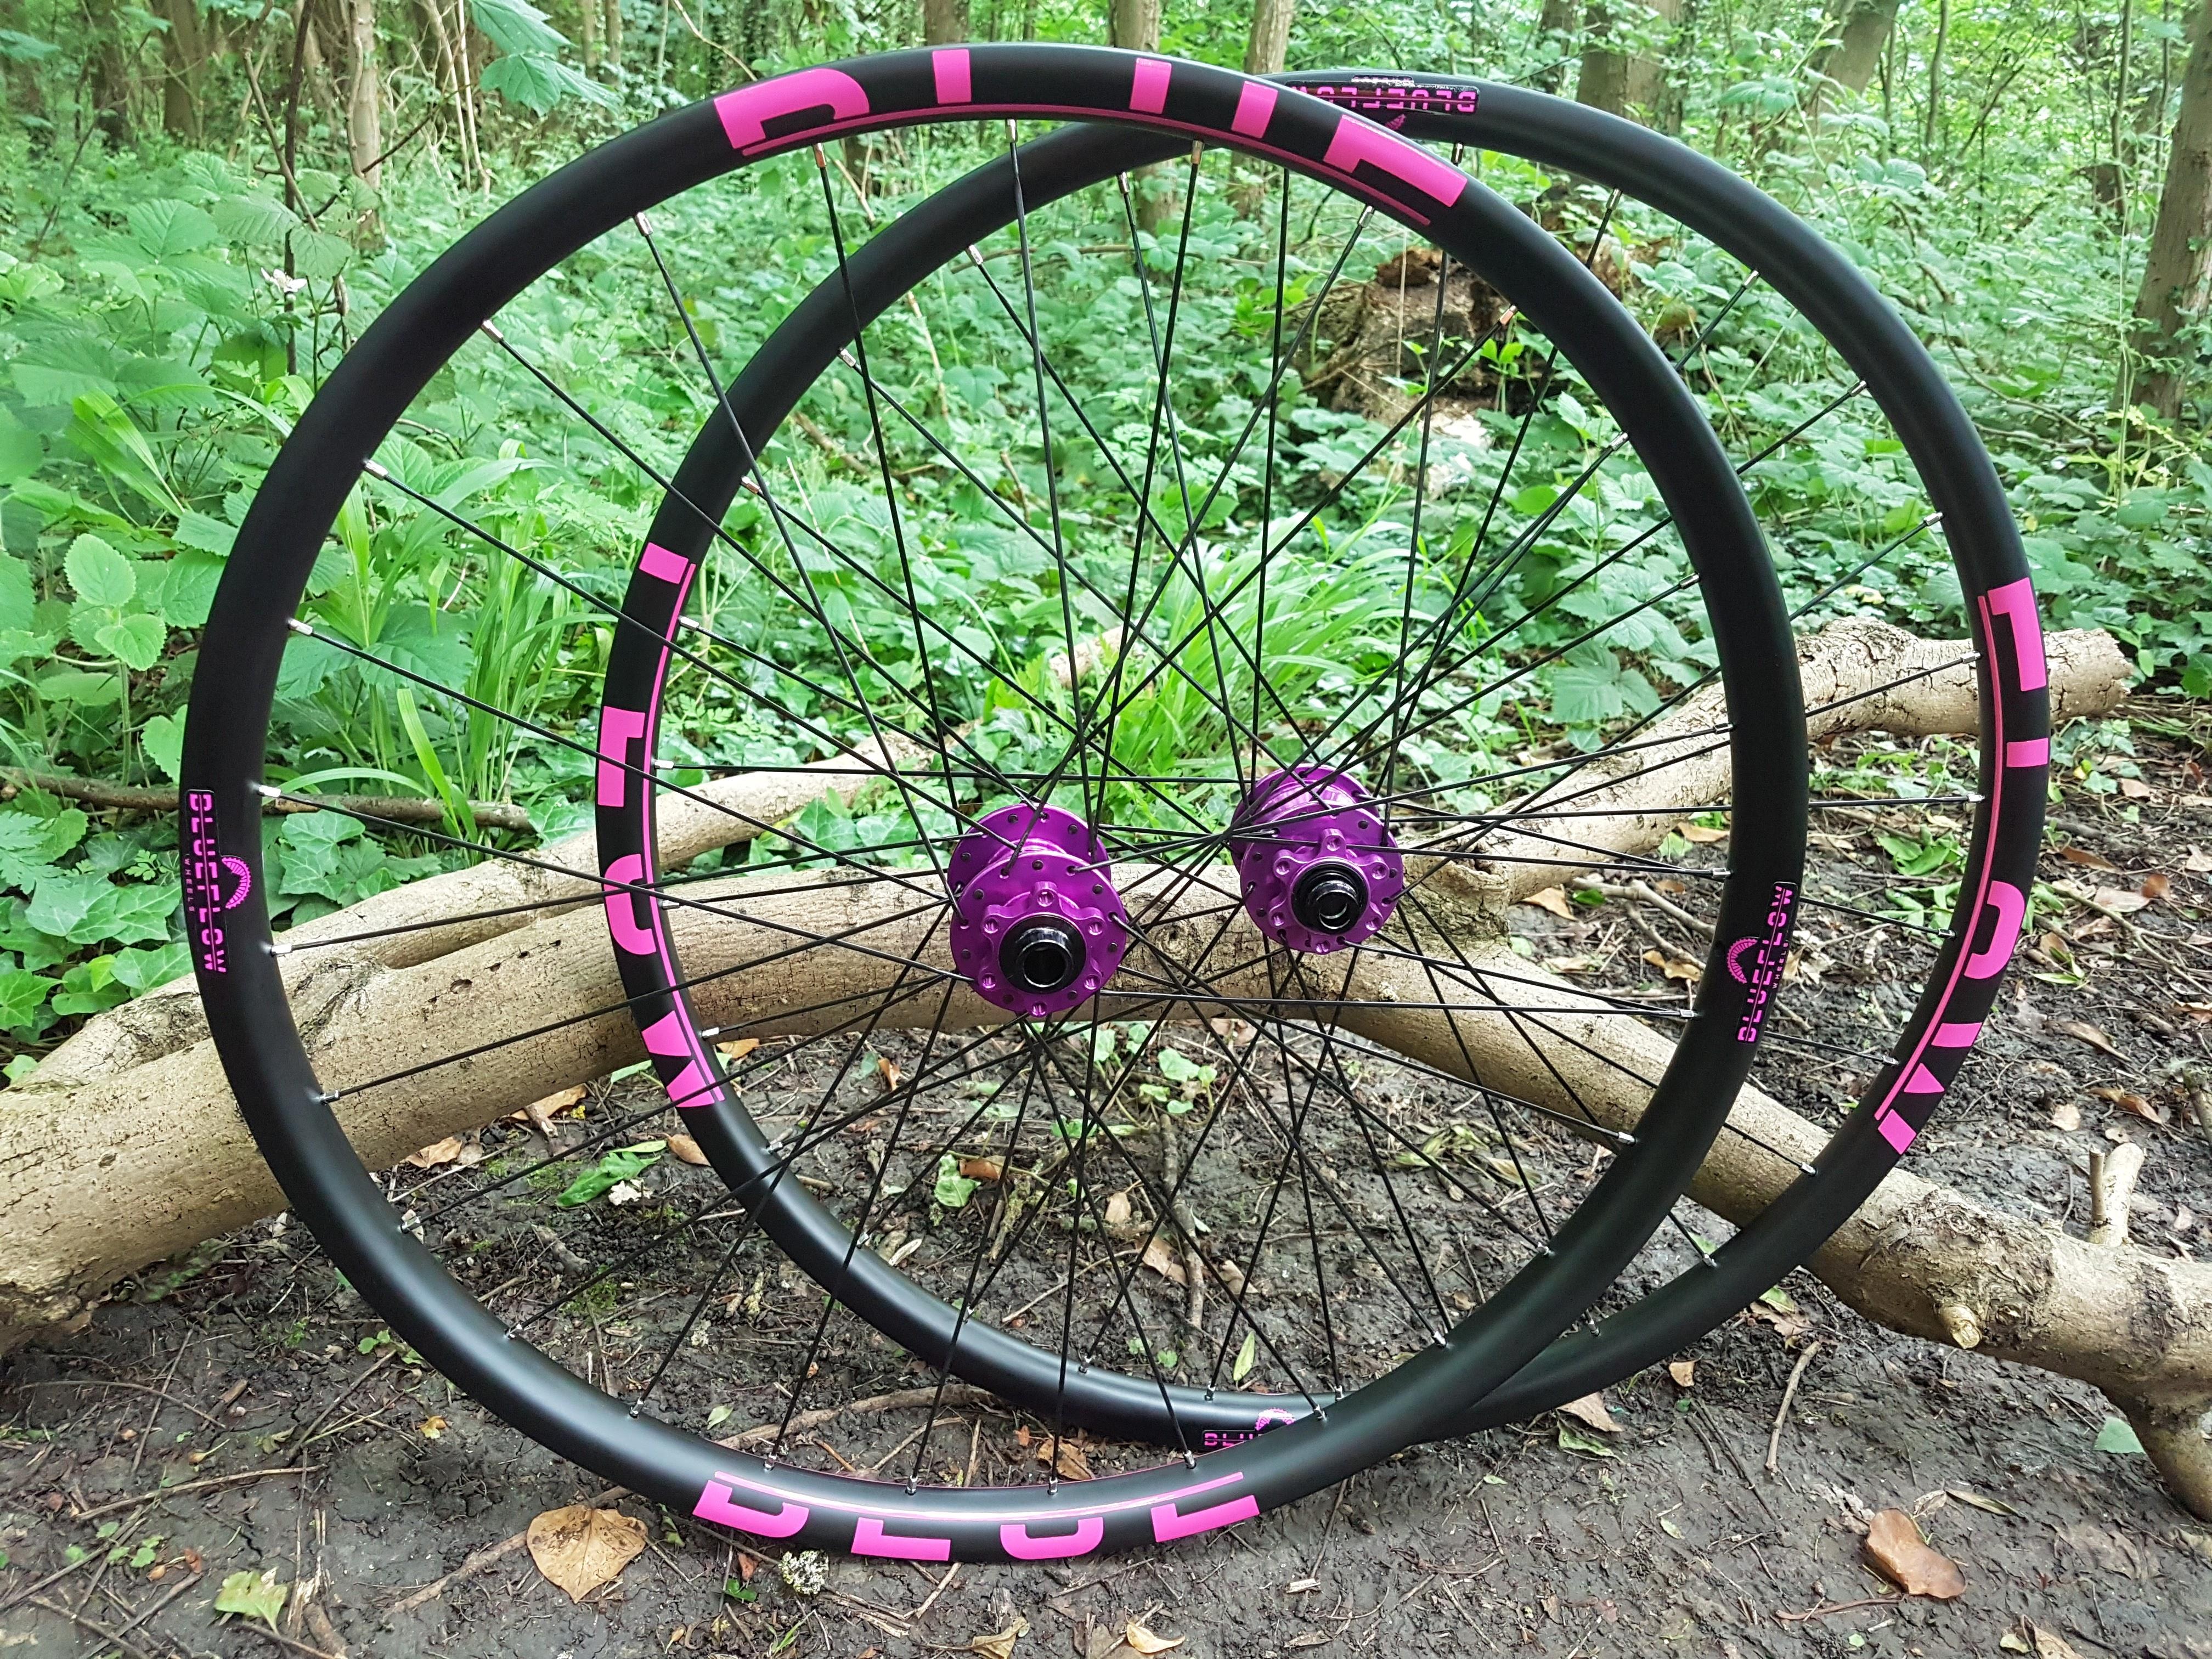 best value carbon mountain bike wheels UK, Blue Flow Wheels, MTB, Wheelsets, Mountain Bike Wheels, Custom built, Free UK Delivery